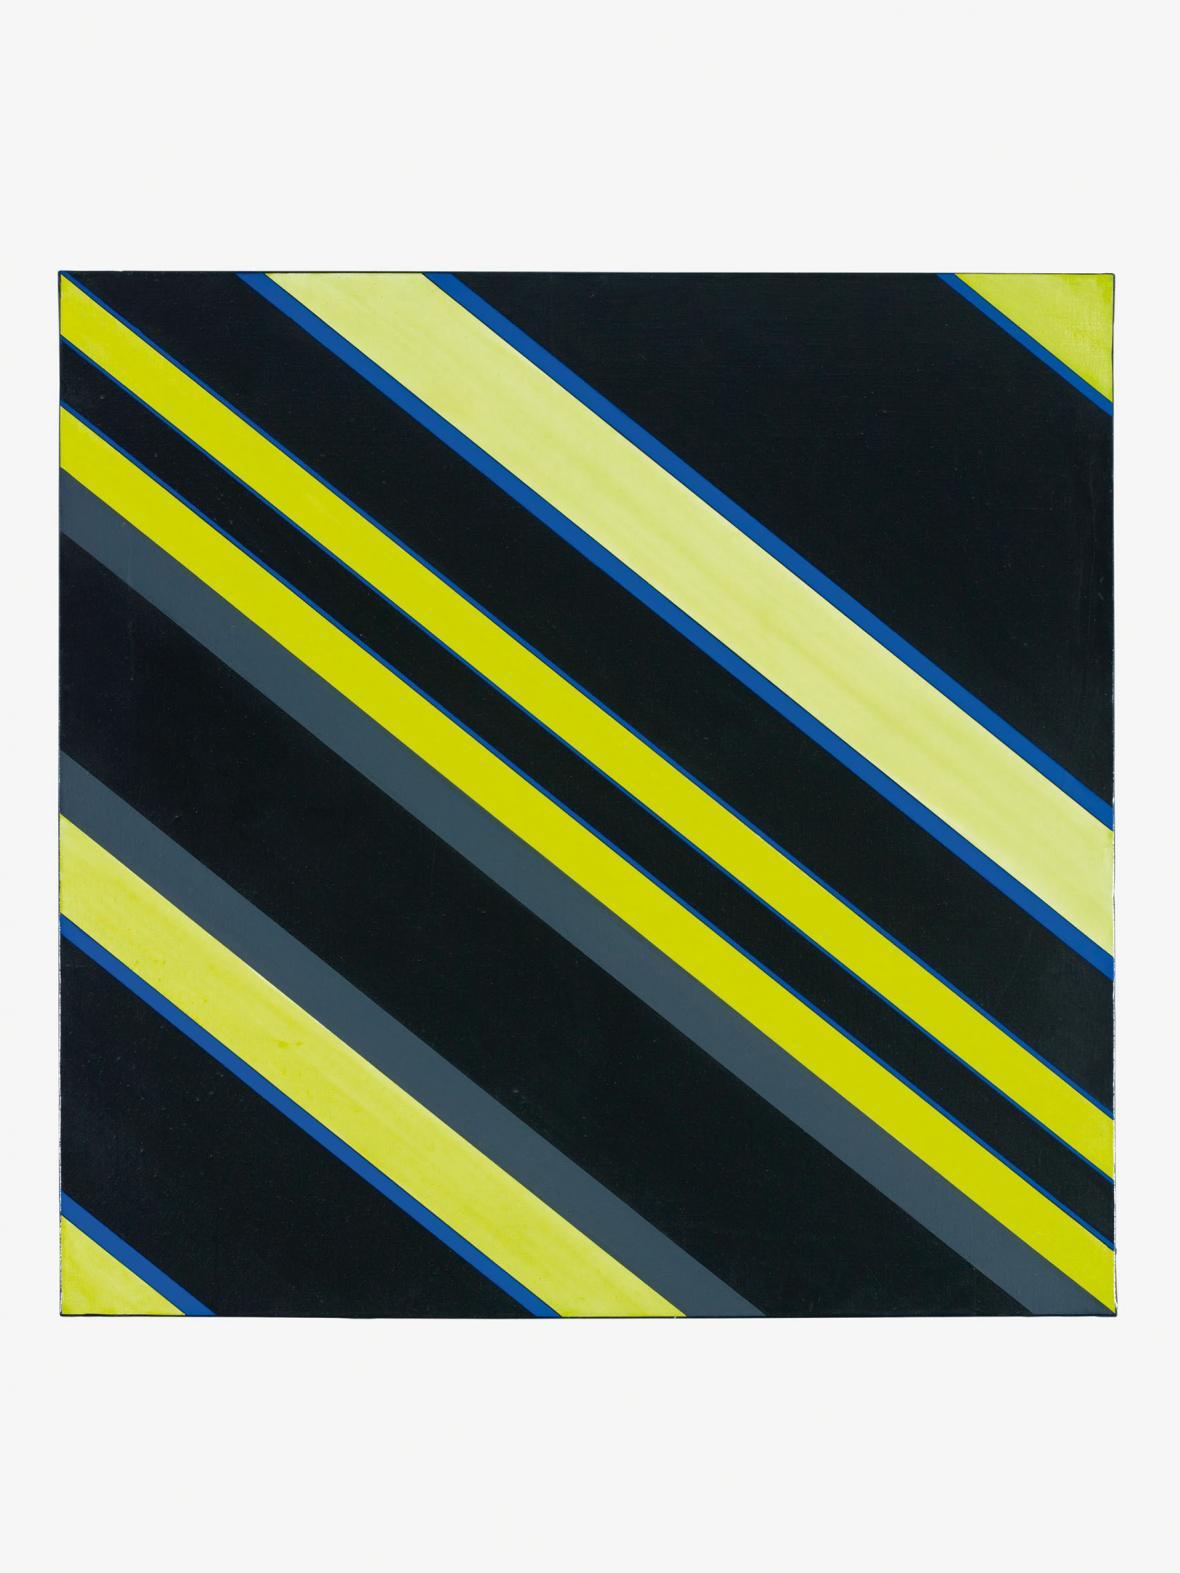 Günter Fruhtrunk / Šedá-černá-žlutá, 1970